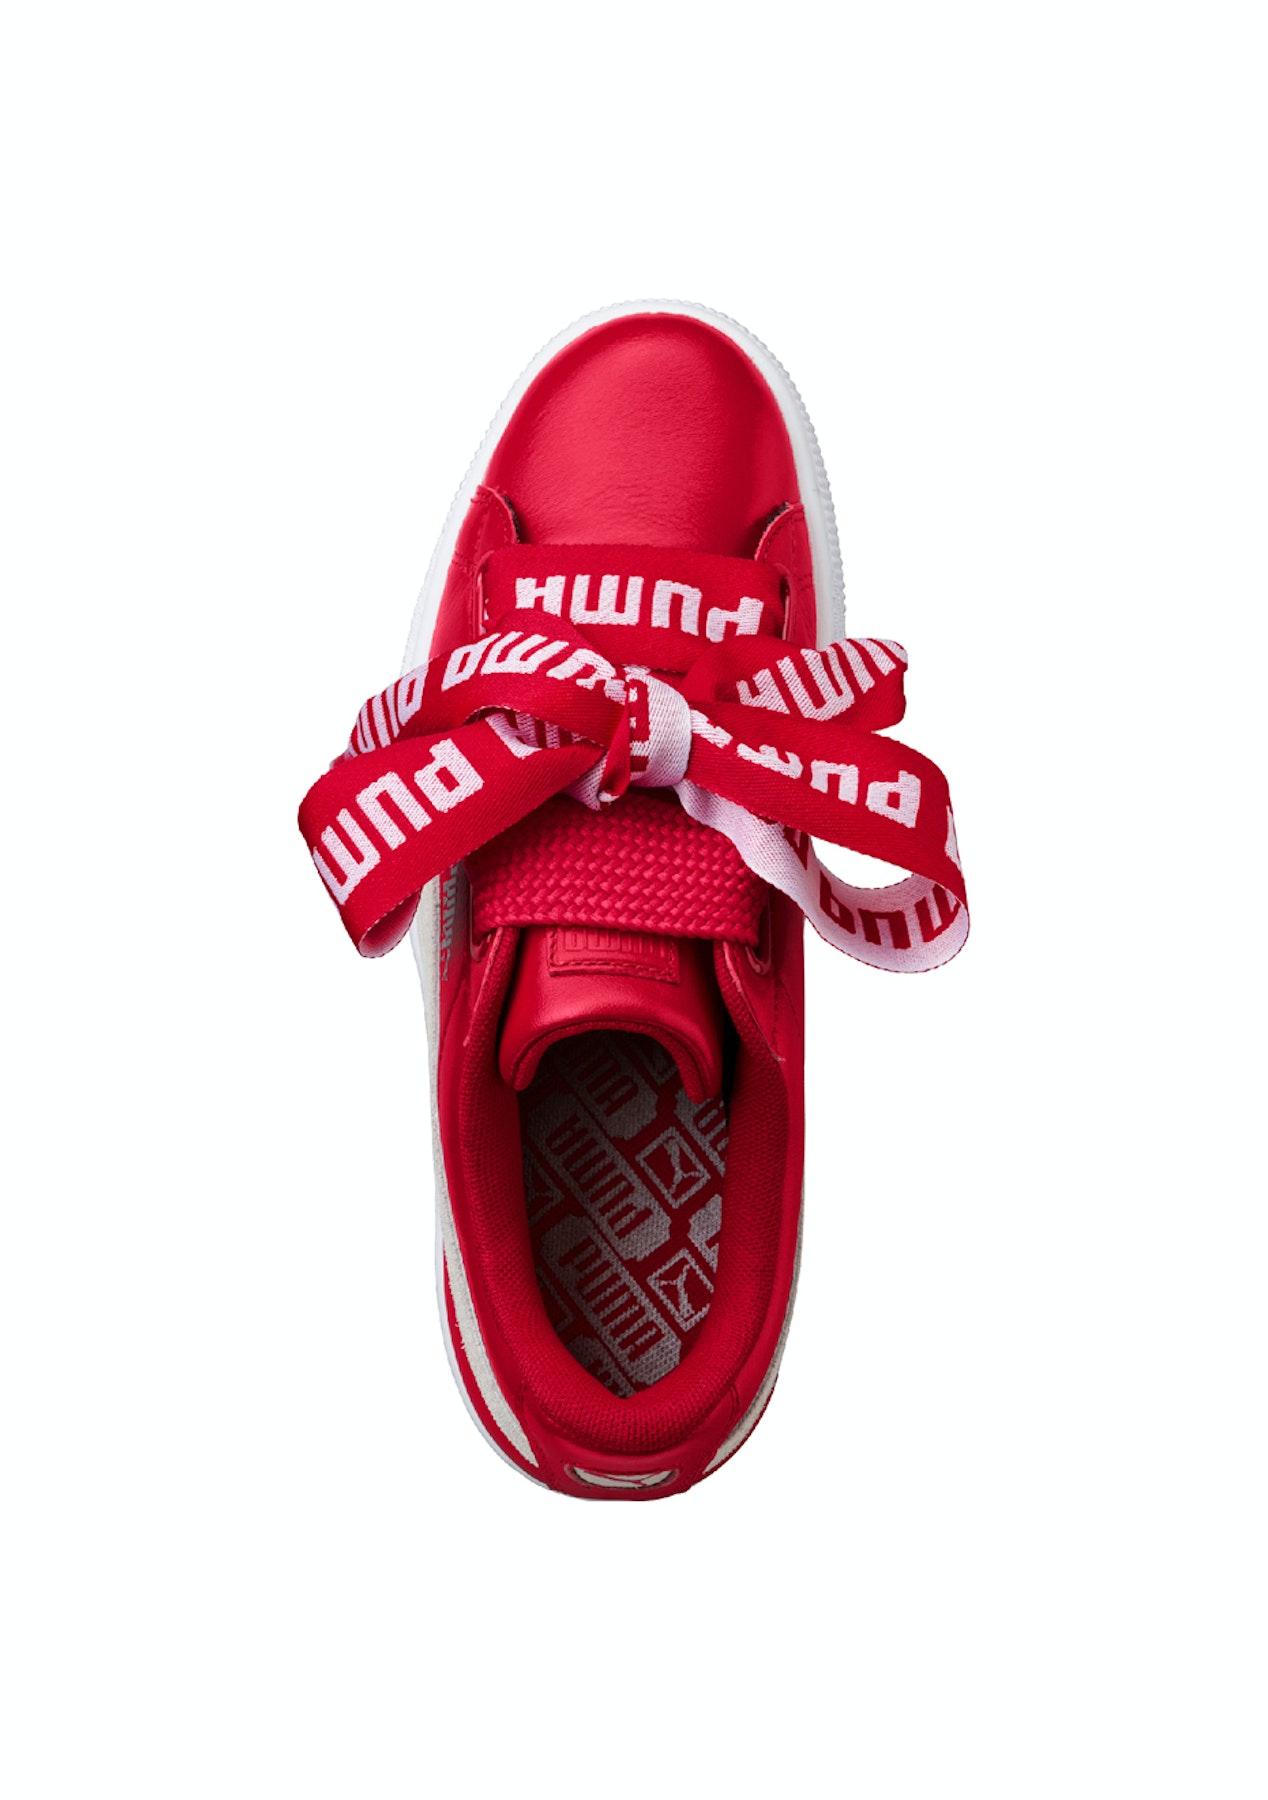 classic fit 0fcd8 dd34a Puma Womens - Basket Heart De Toreador Red